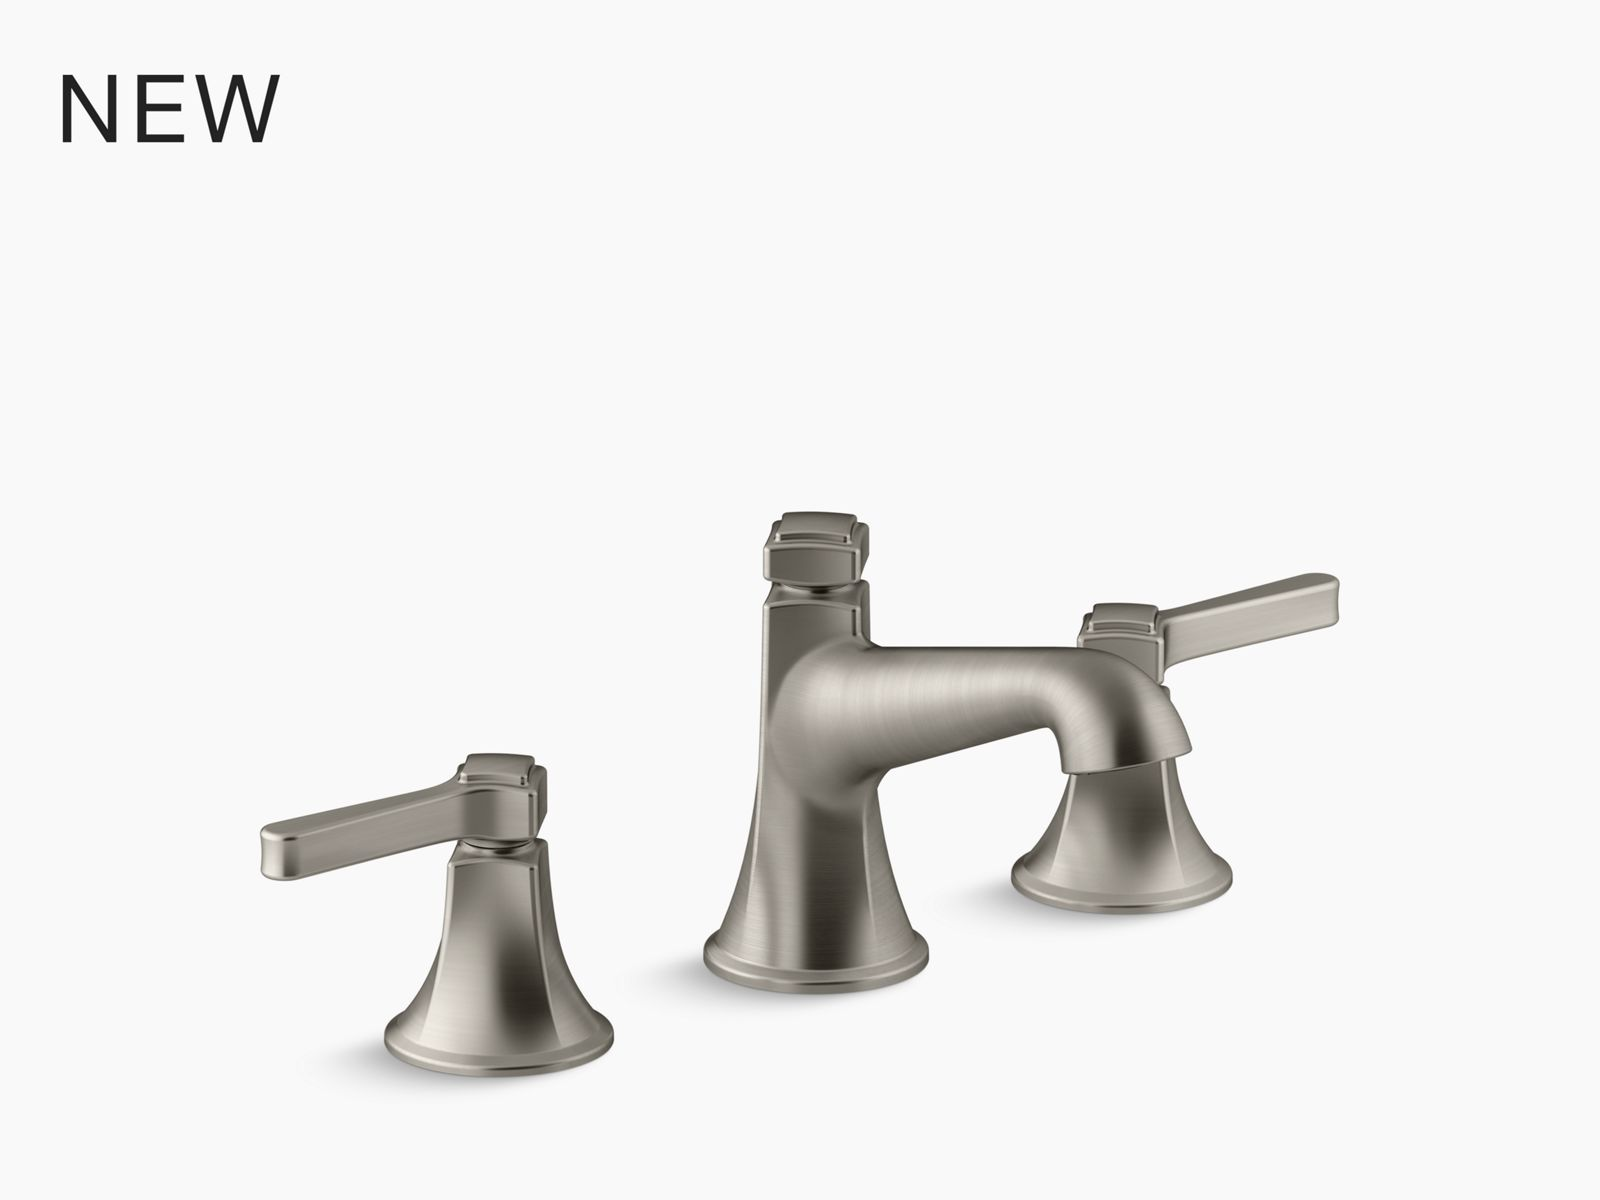 Purist Widespread Sink Faucet with Low Cross Handles K 14406 3